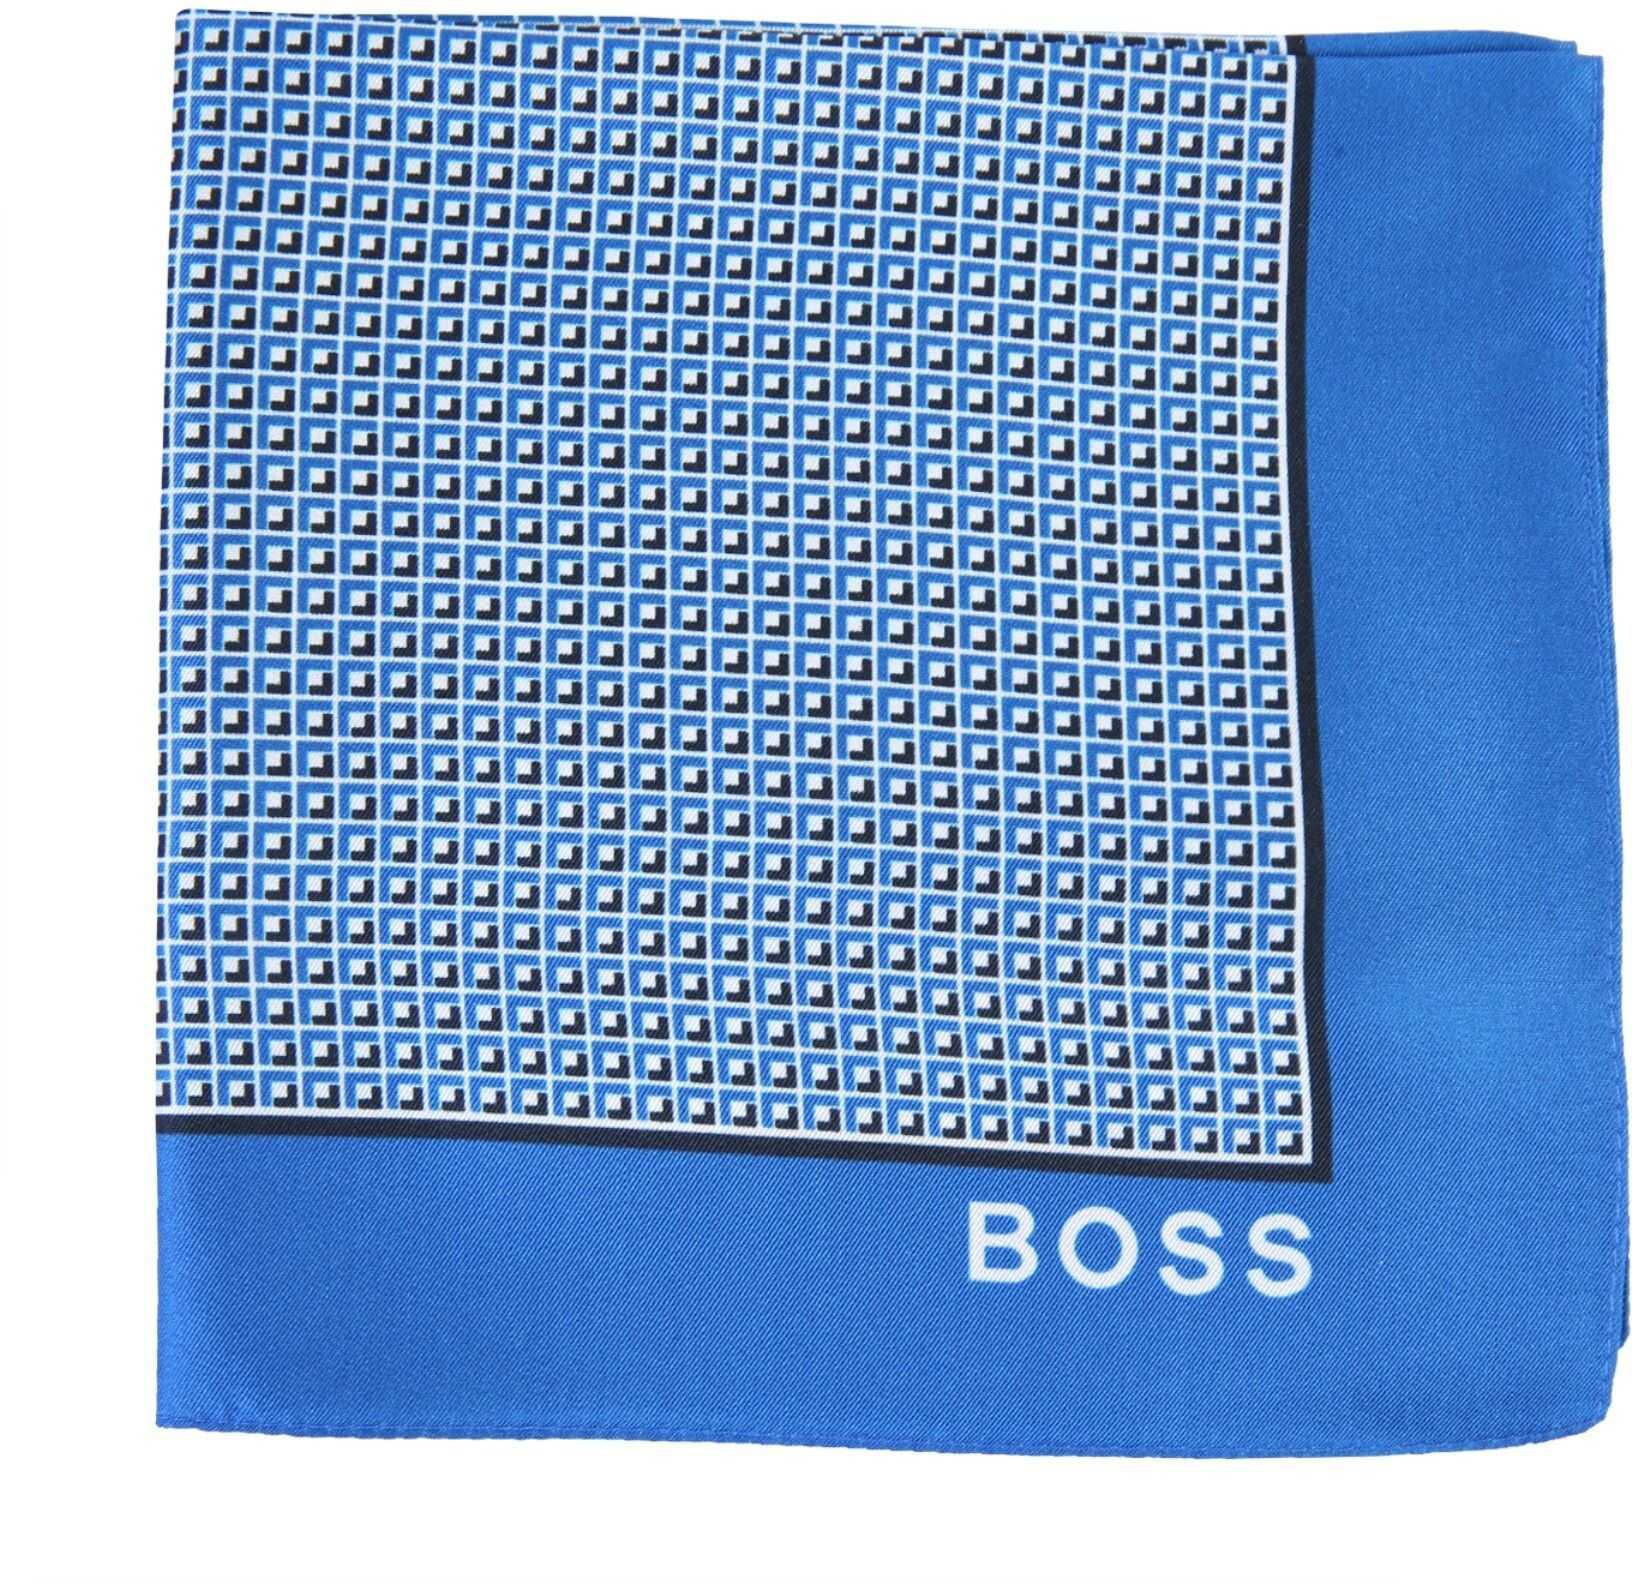 BOSS Printed Scarf BLUE